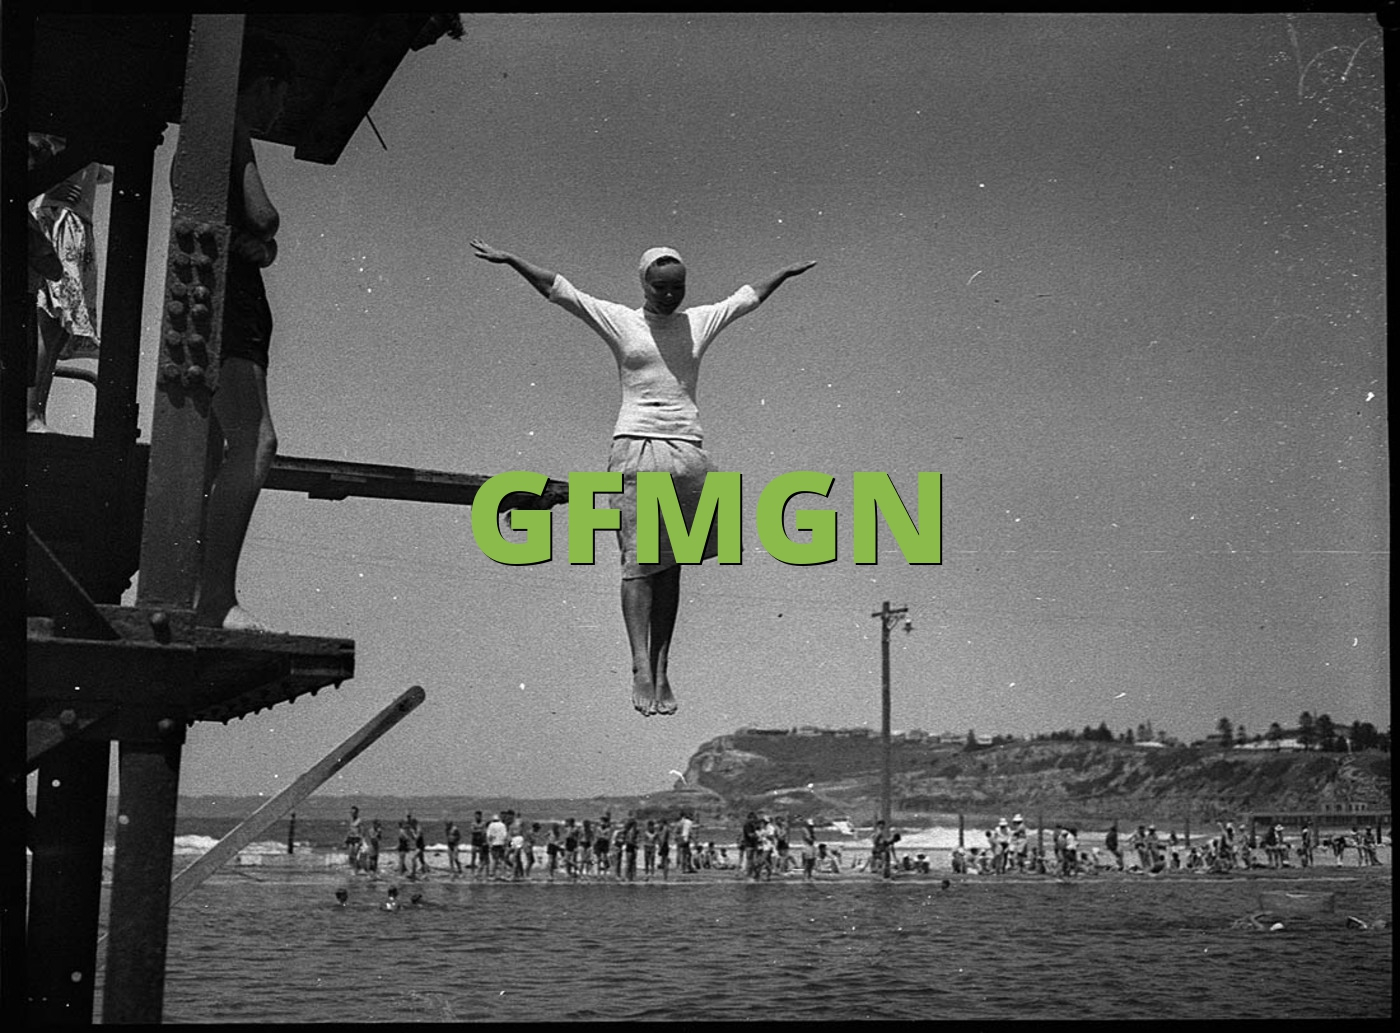 GFMGN